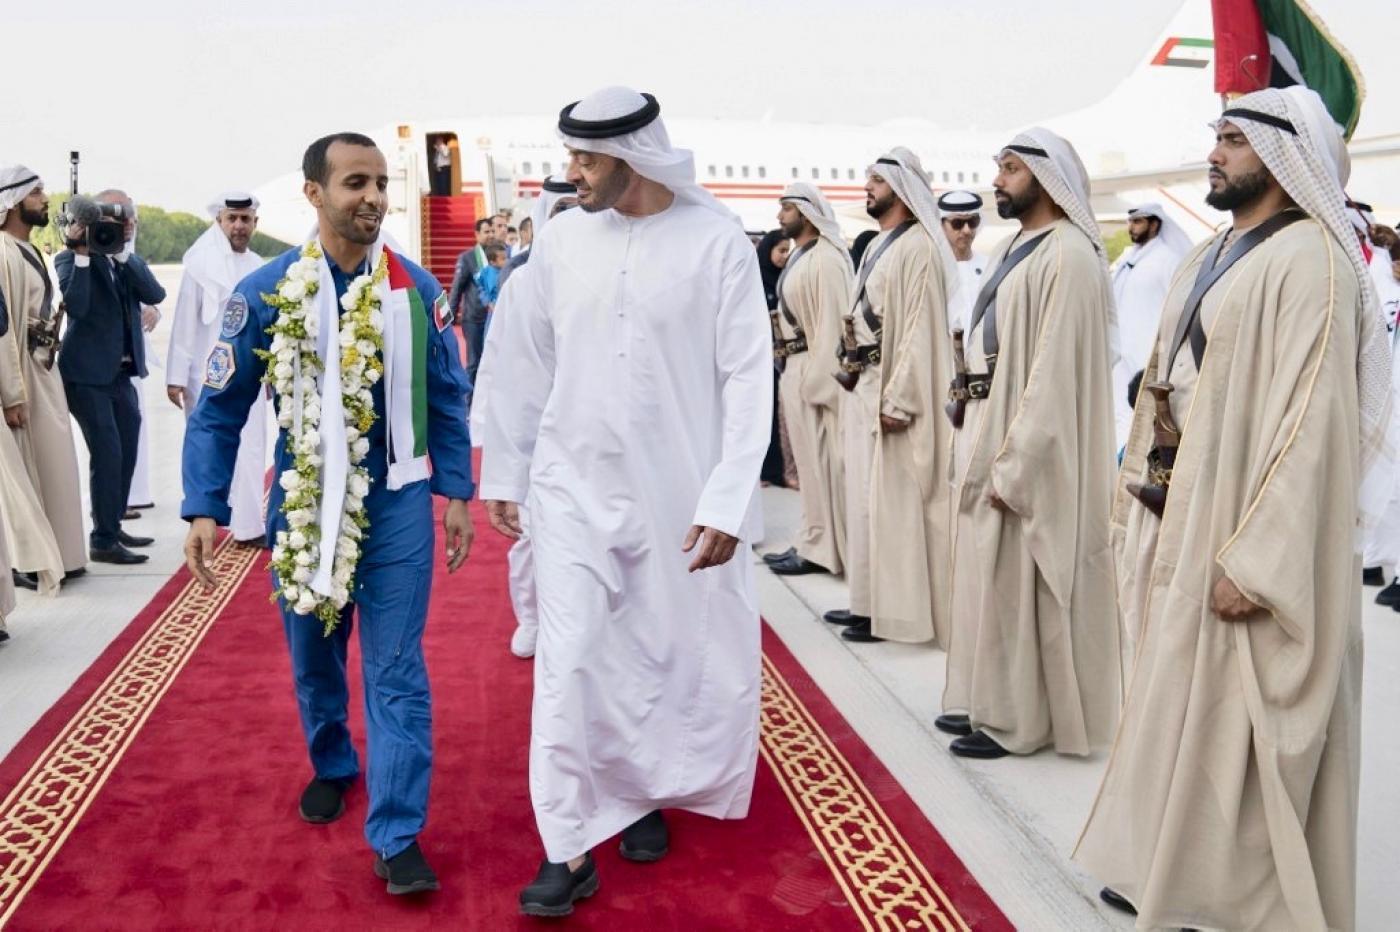 bin_zayed_uae-afp-10_12_19